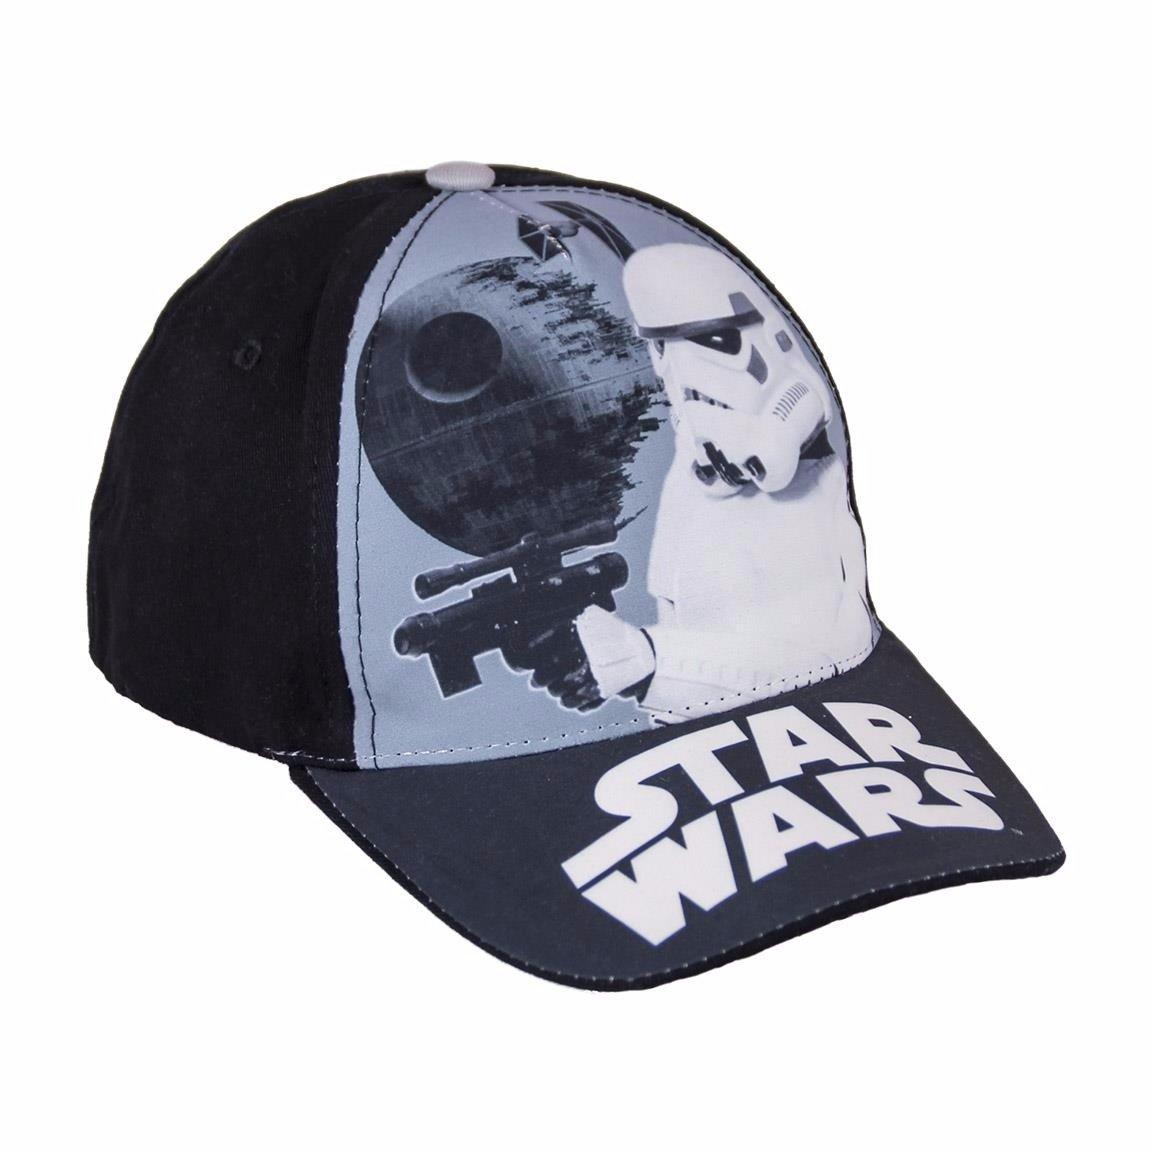 Gorra Stormtrooper Star Wars: Amazon.es: Bebé